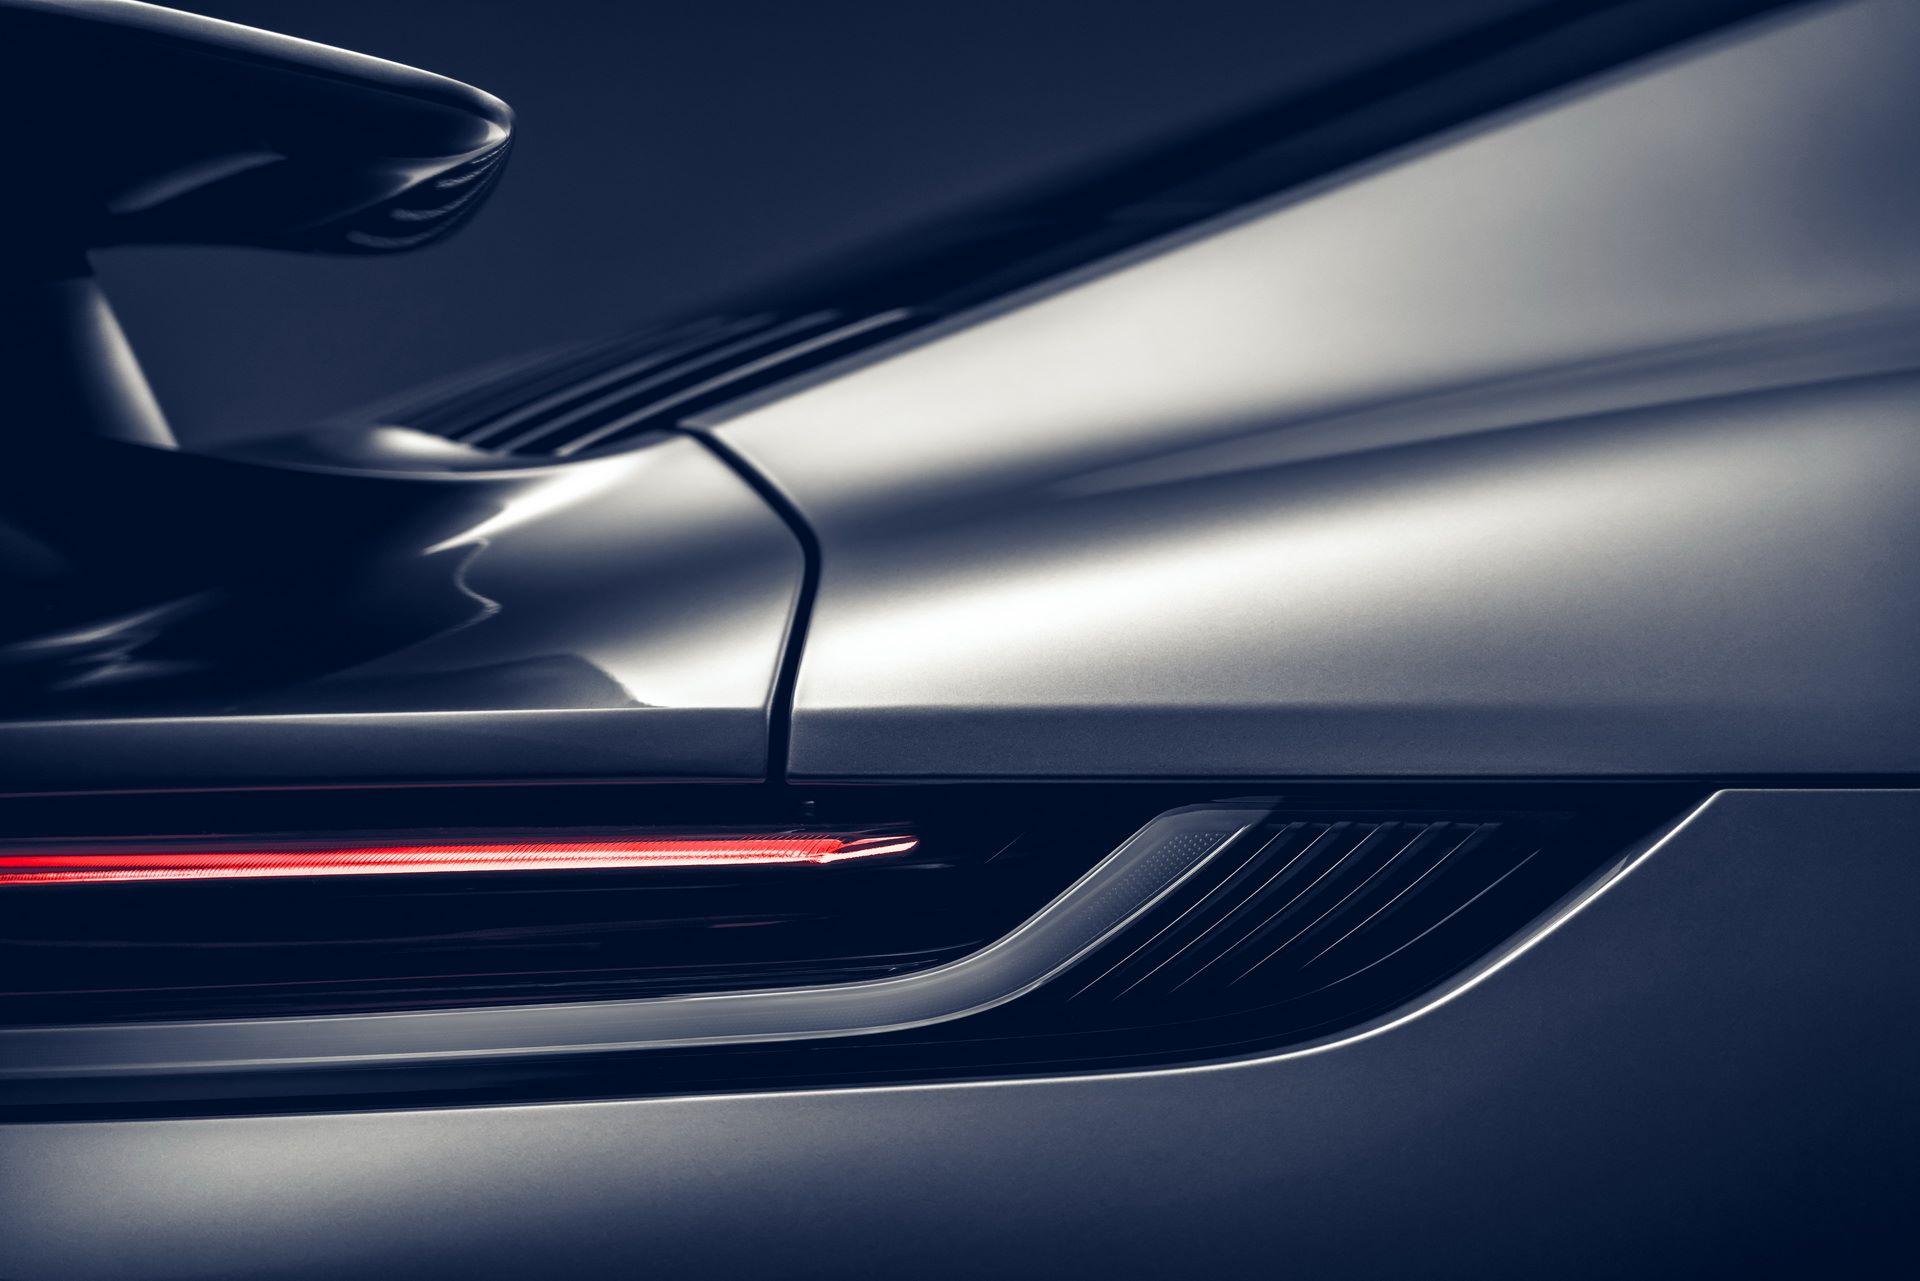 Porsche-911-Turbo-S-2020-36